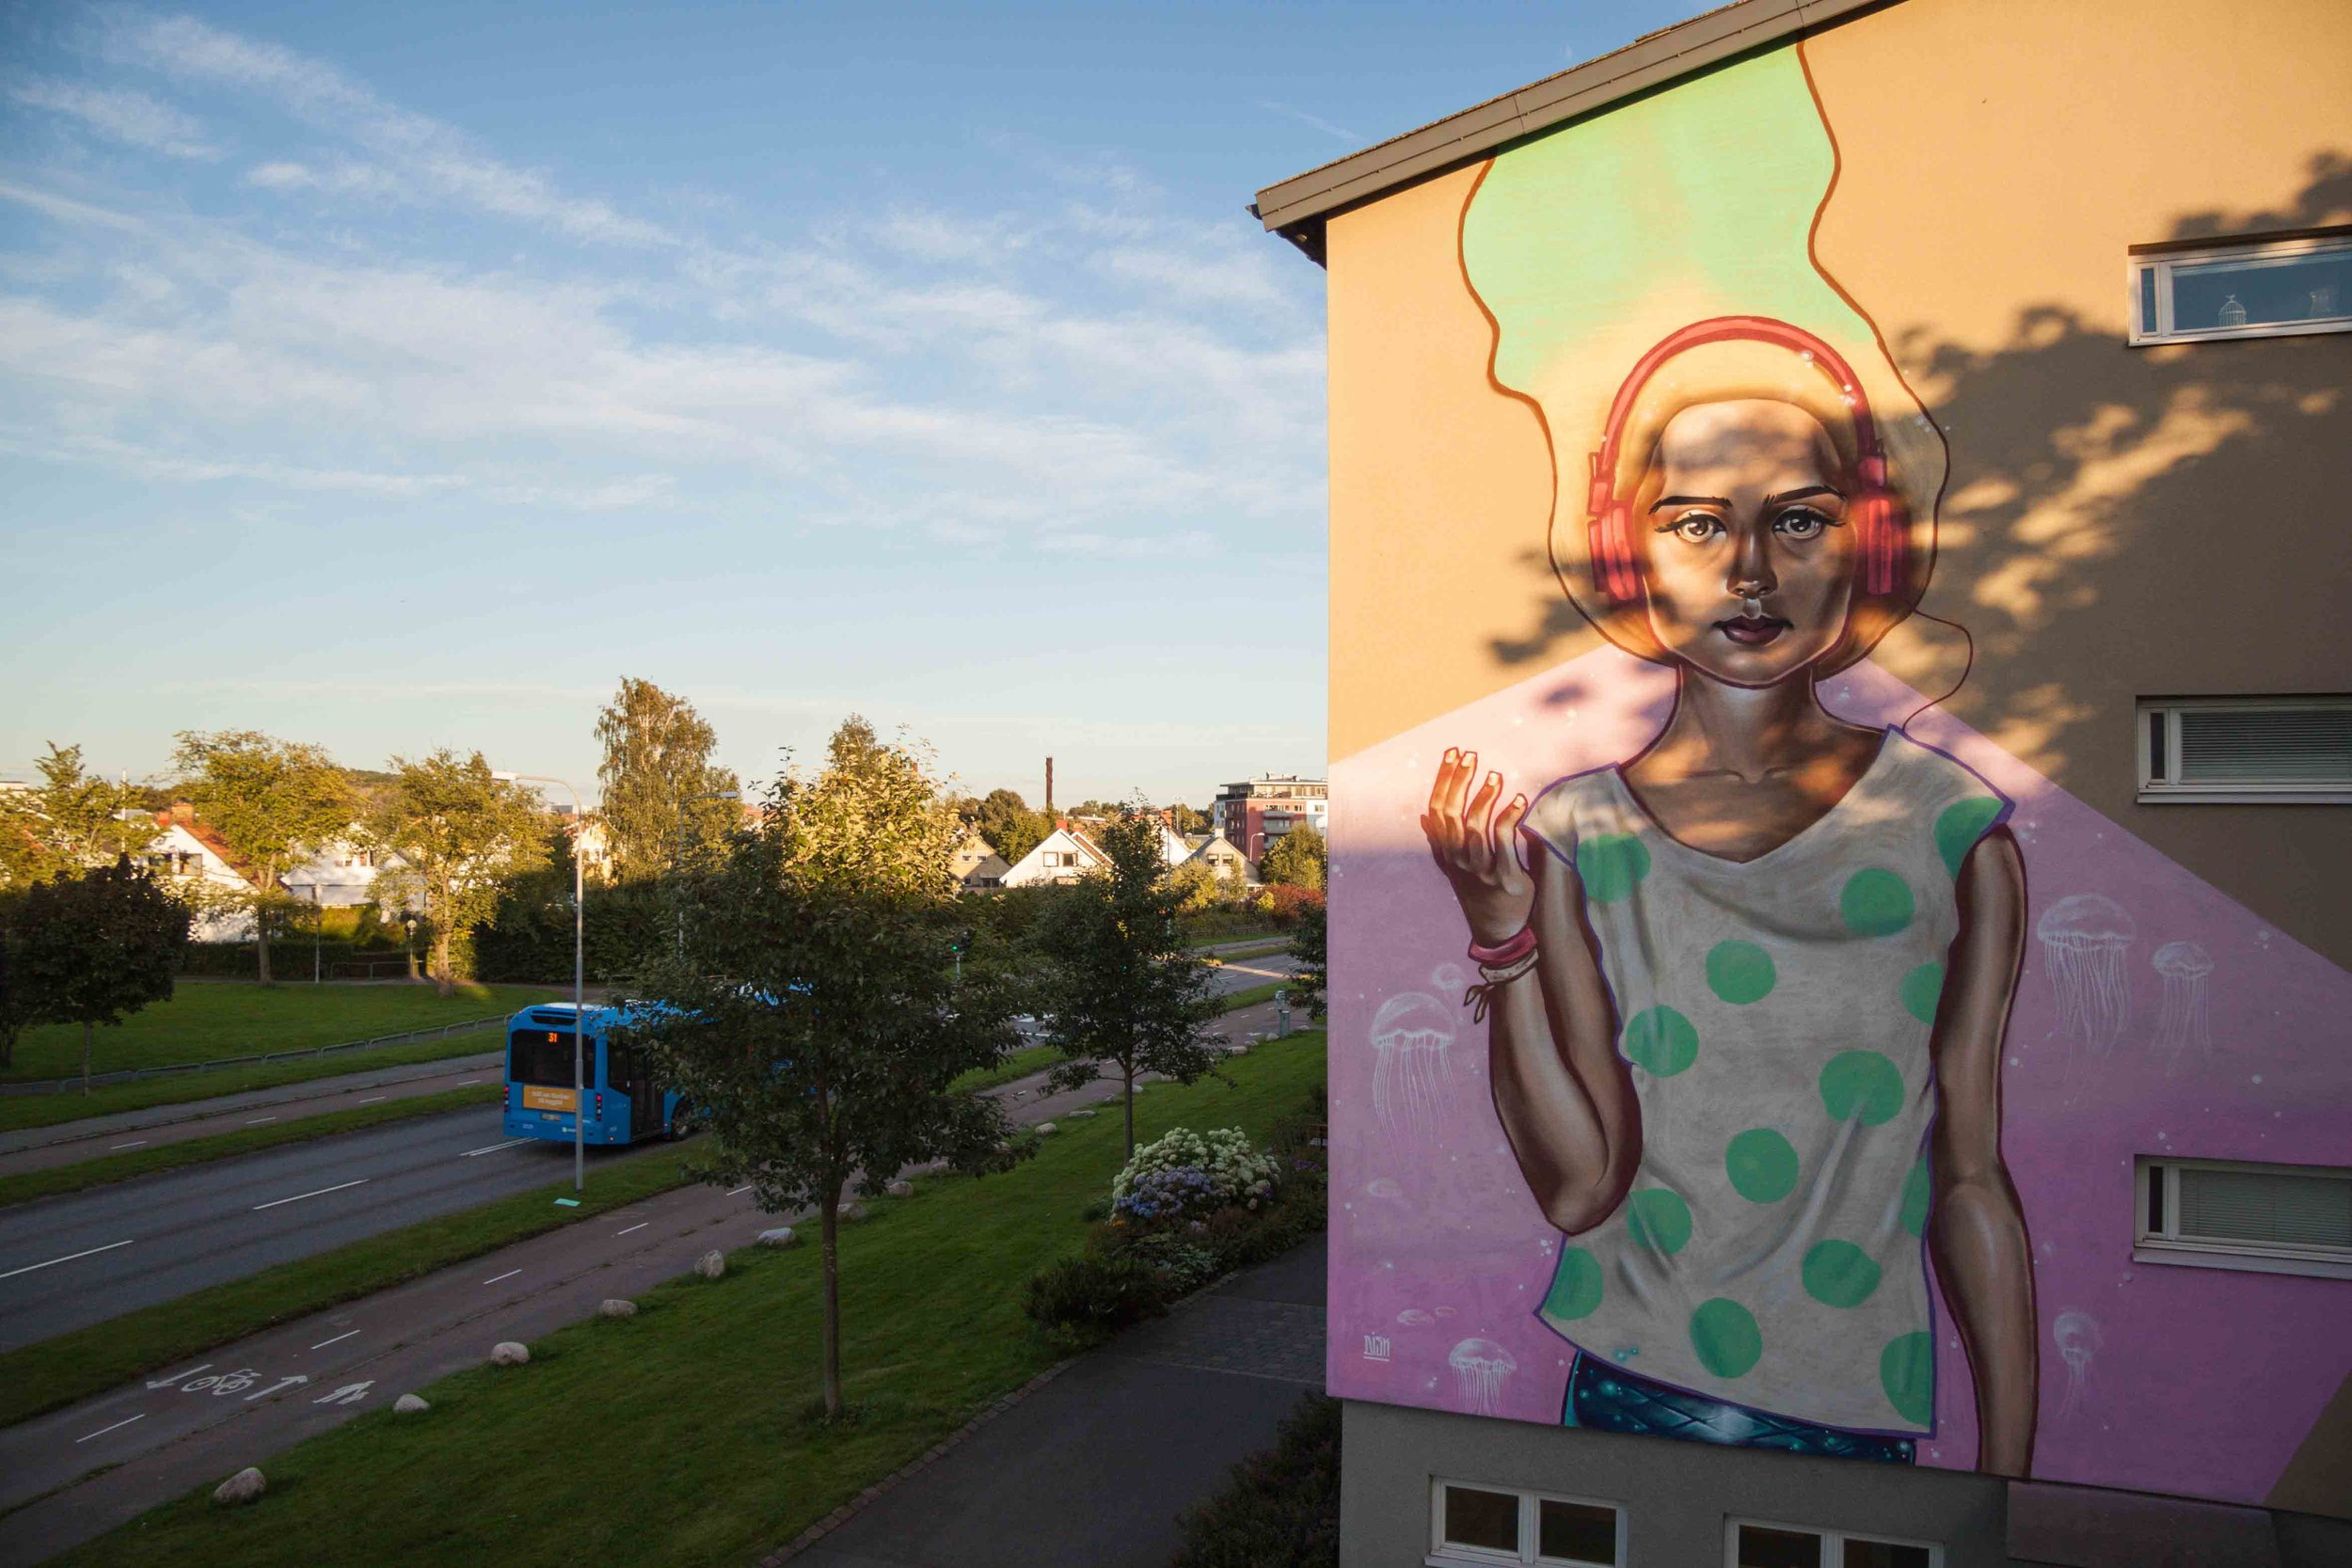 DISK_Artscape_2016-08-16_FredrikÅkerberg_4693x3129_8.jpg